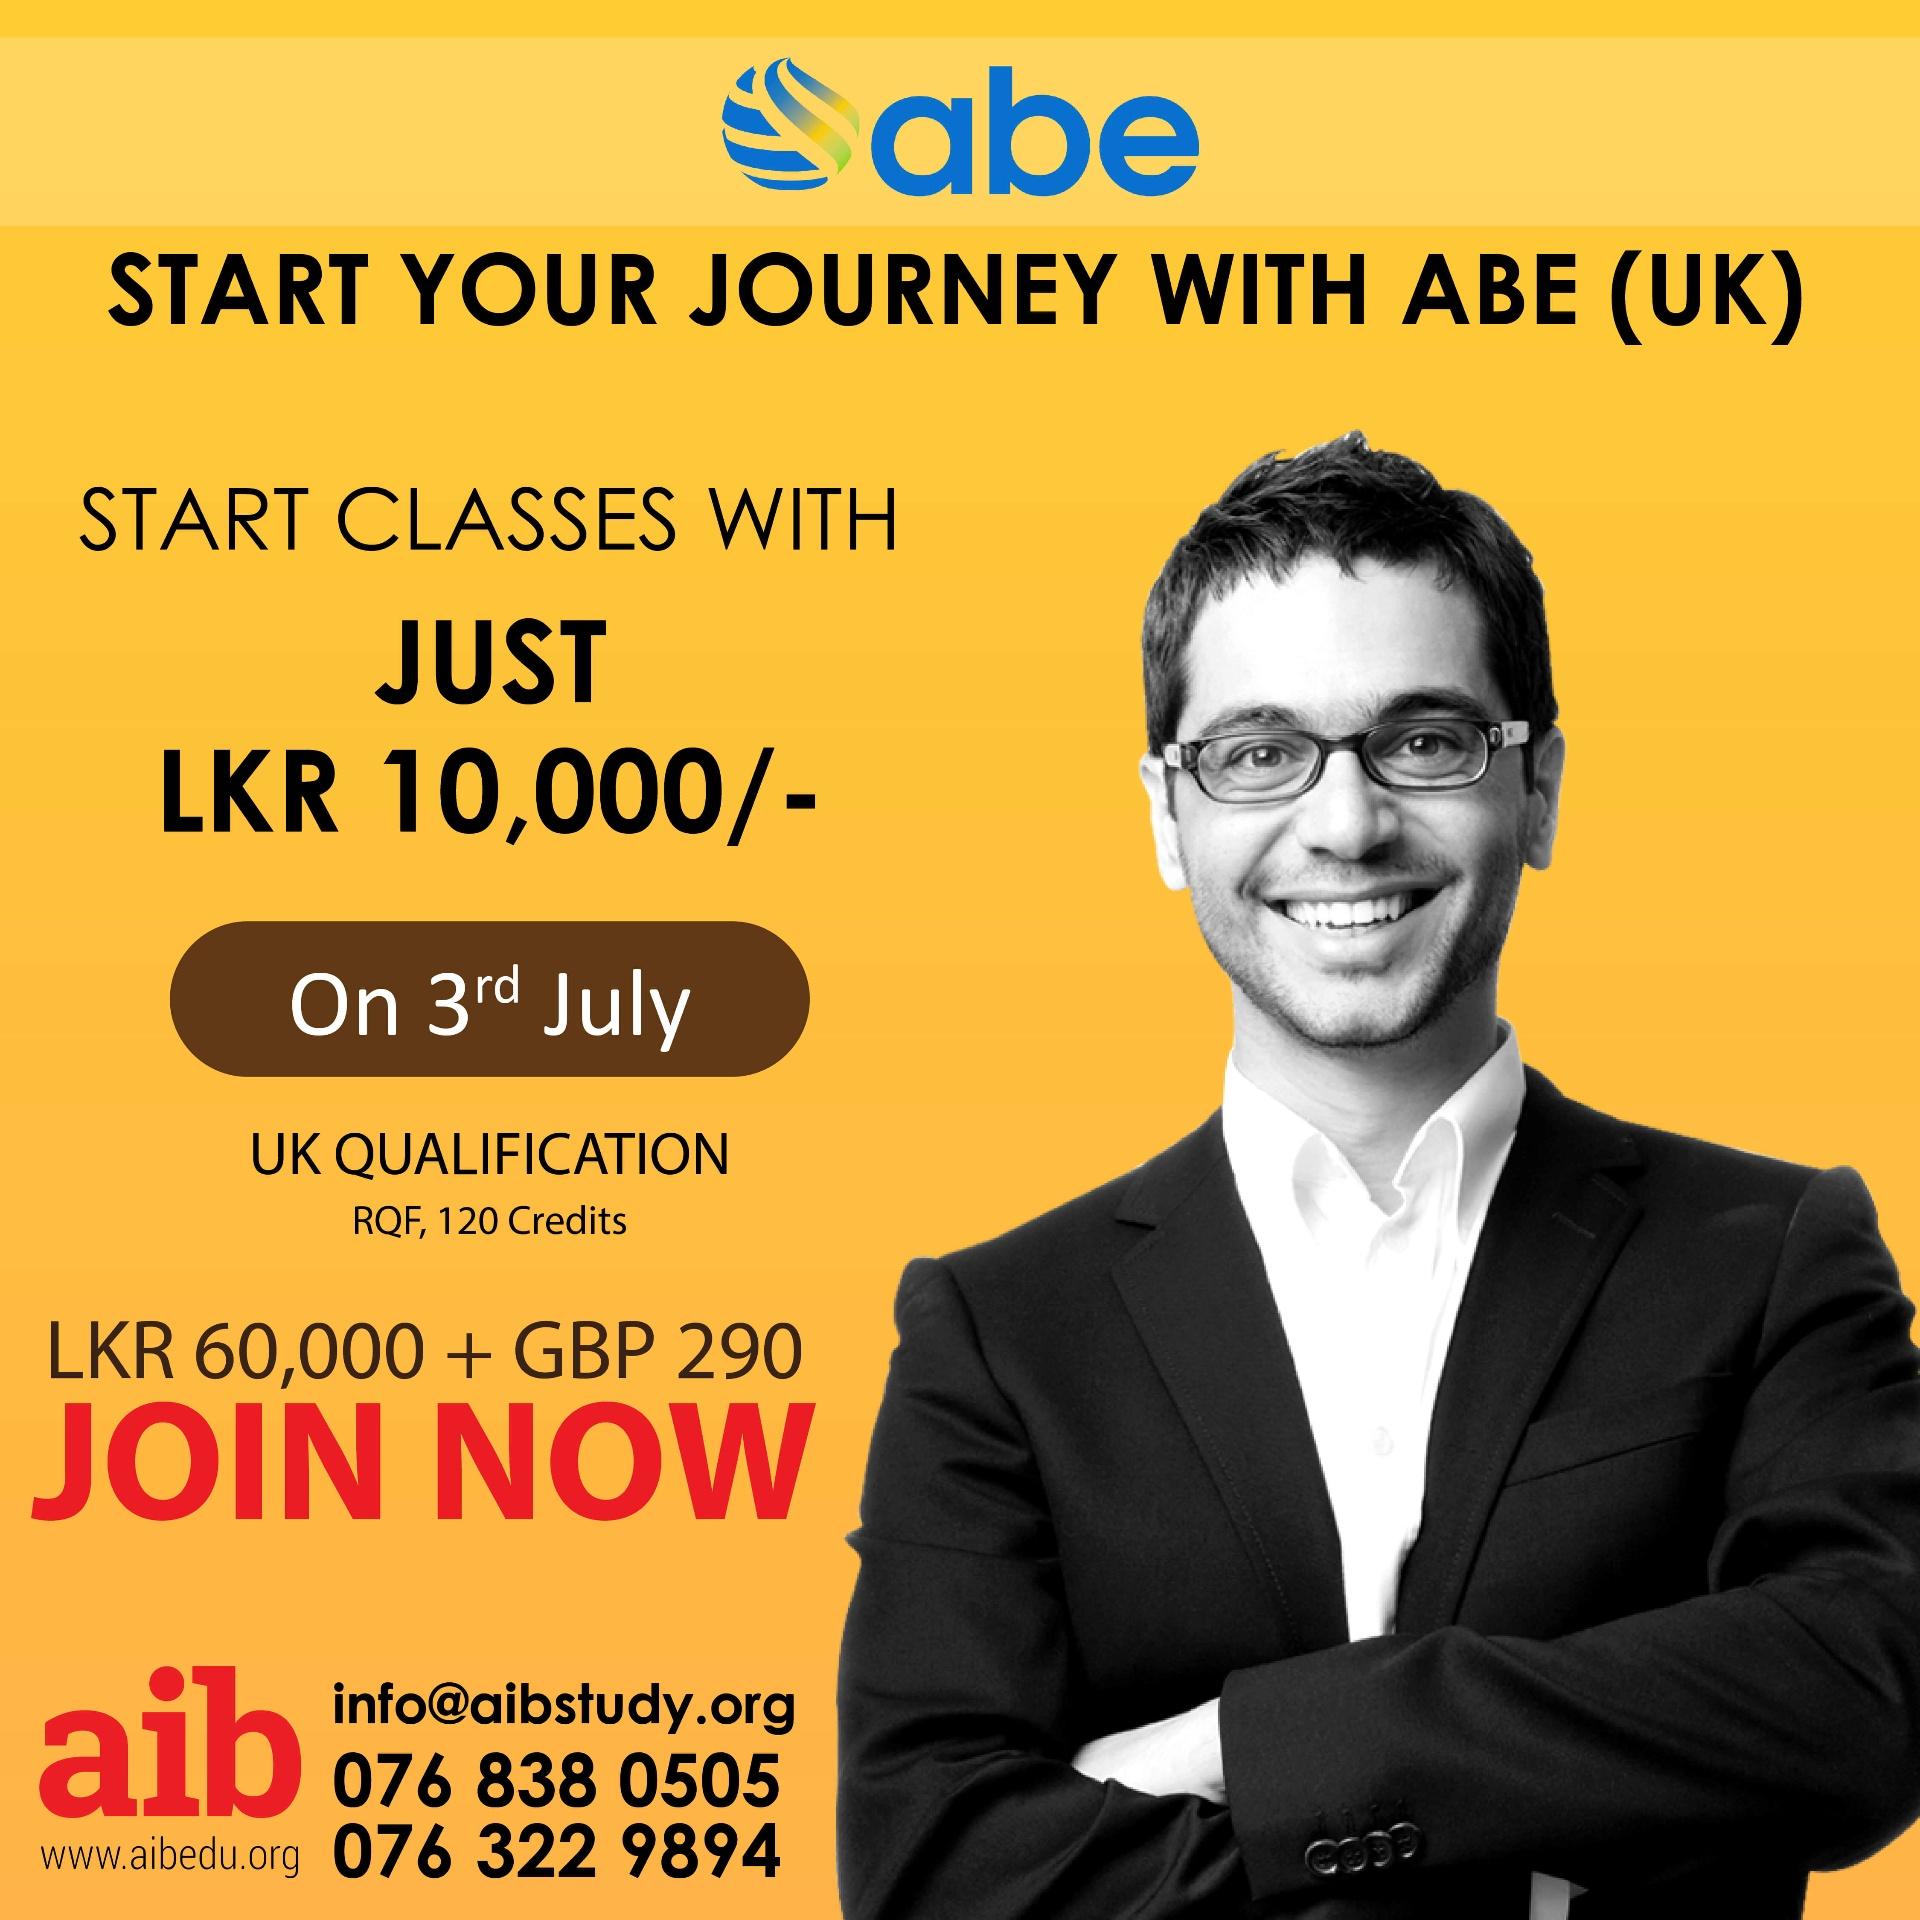 START YOUR JOURNEY WITH ABE (UK)